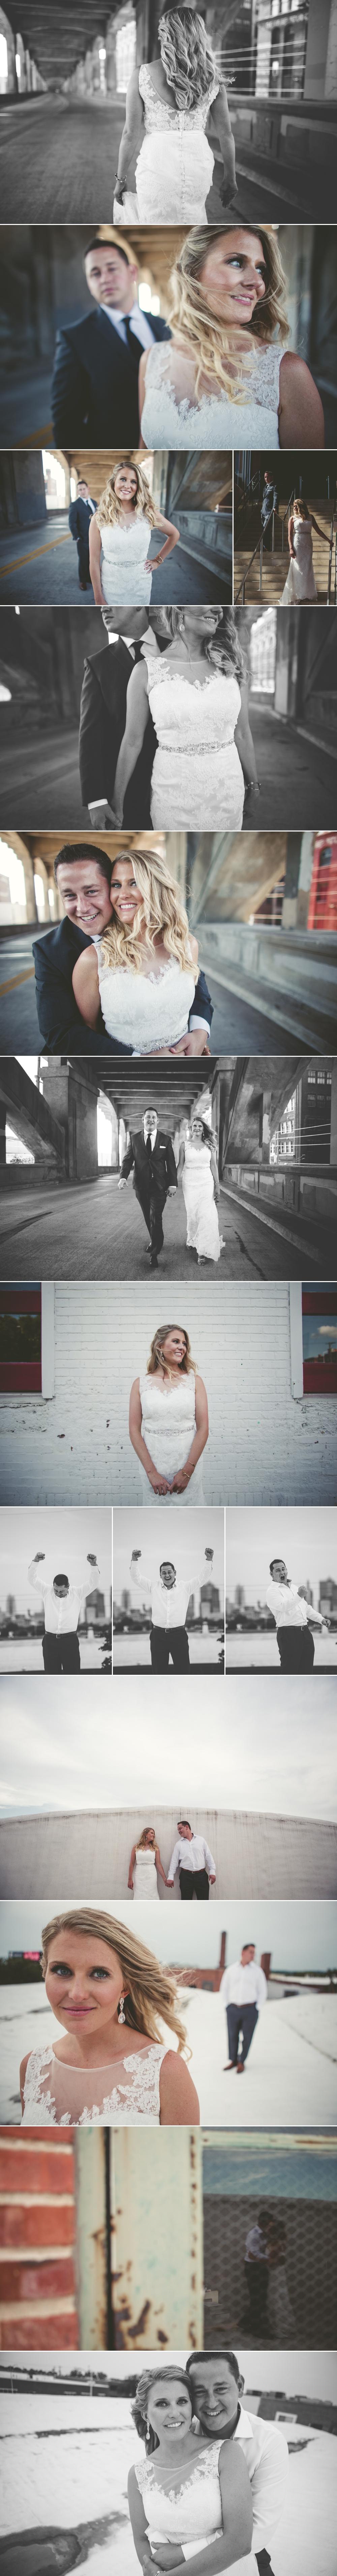 jason_domingues_photography_best_kansas_city_wedding_photographer_kc_weddings_black_on_burlington_0002